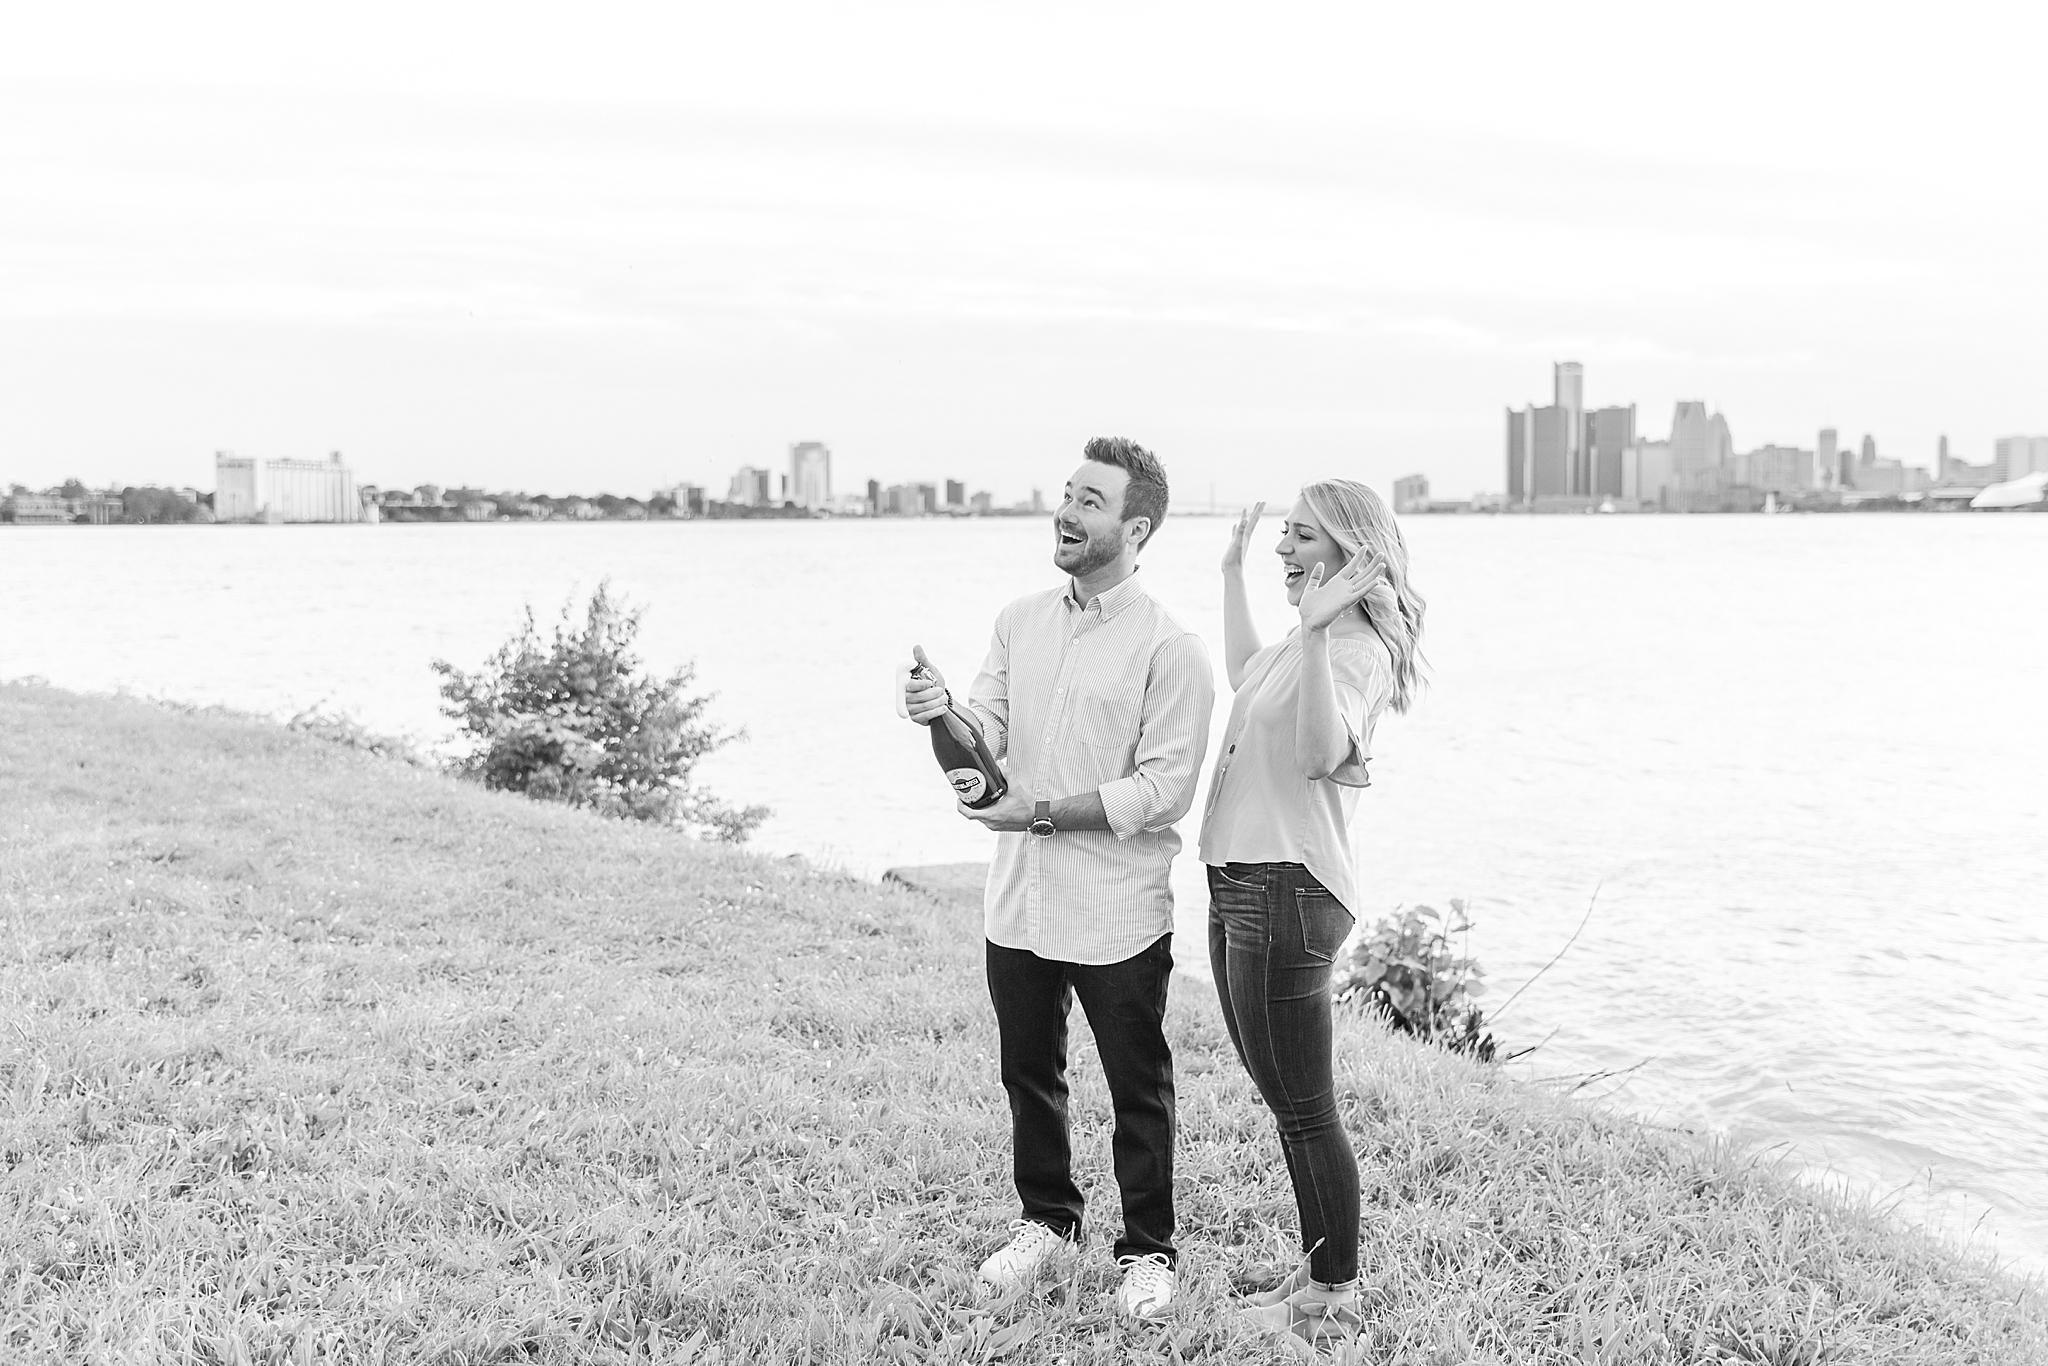 detroit-wedding-photographer-downtown-detroit-belle-isle-engagement-photos-sarah-eric-by-courtney-carolyn-photography_0041.jpg